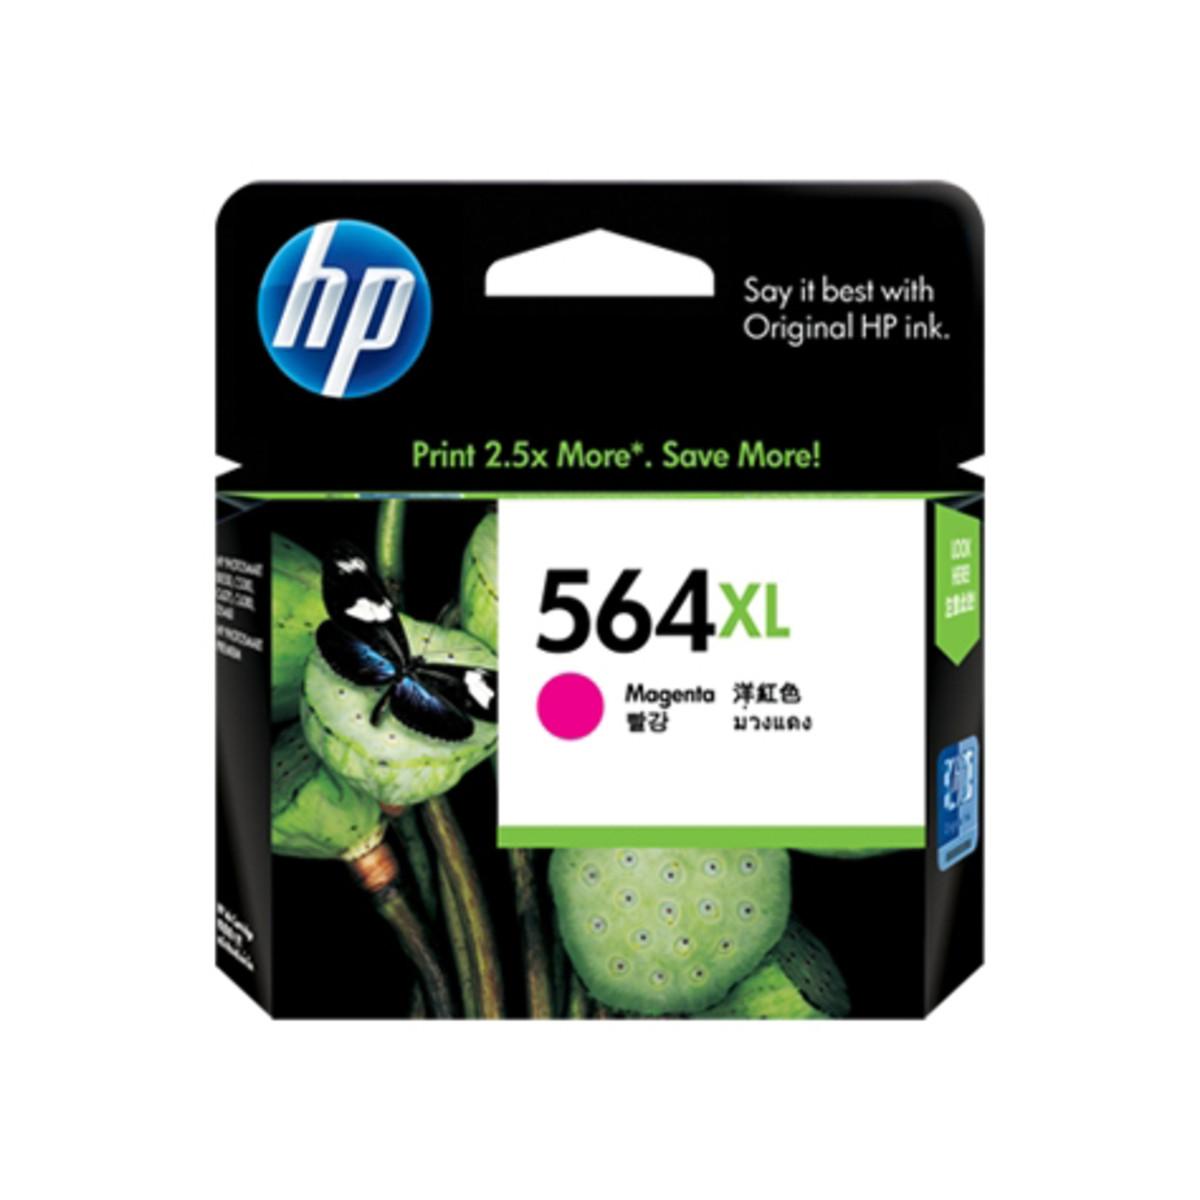 HP 564XL (CB324WA) Magenta Ink Cartridge - High Yield